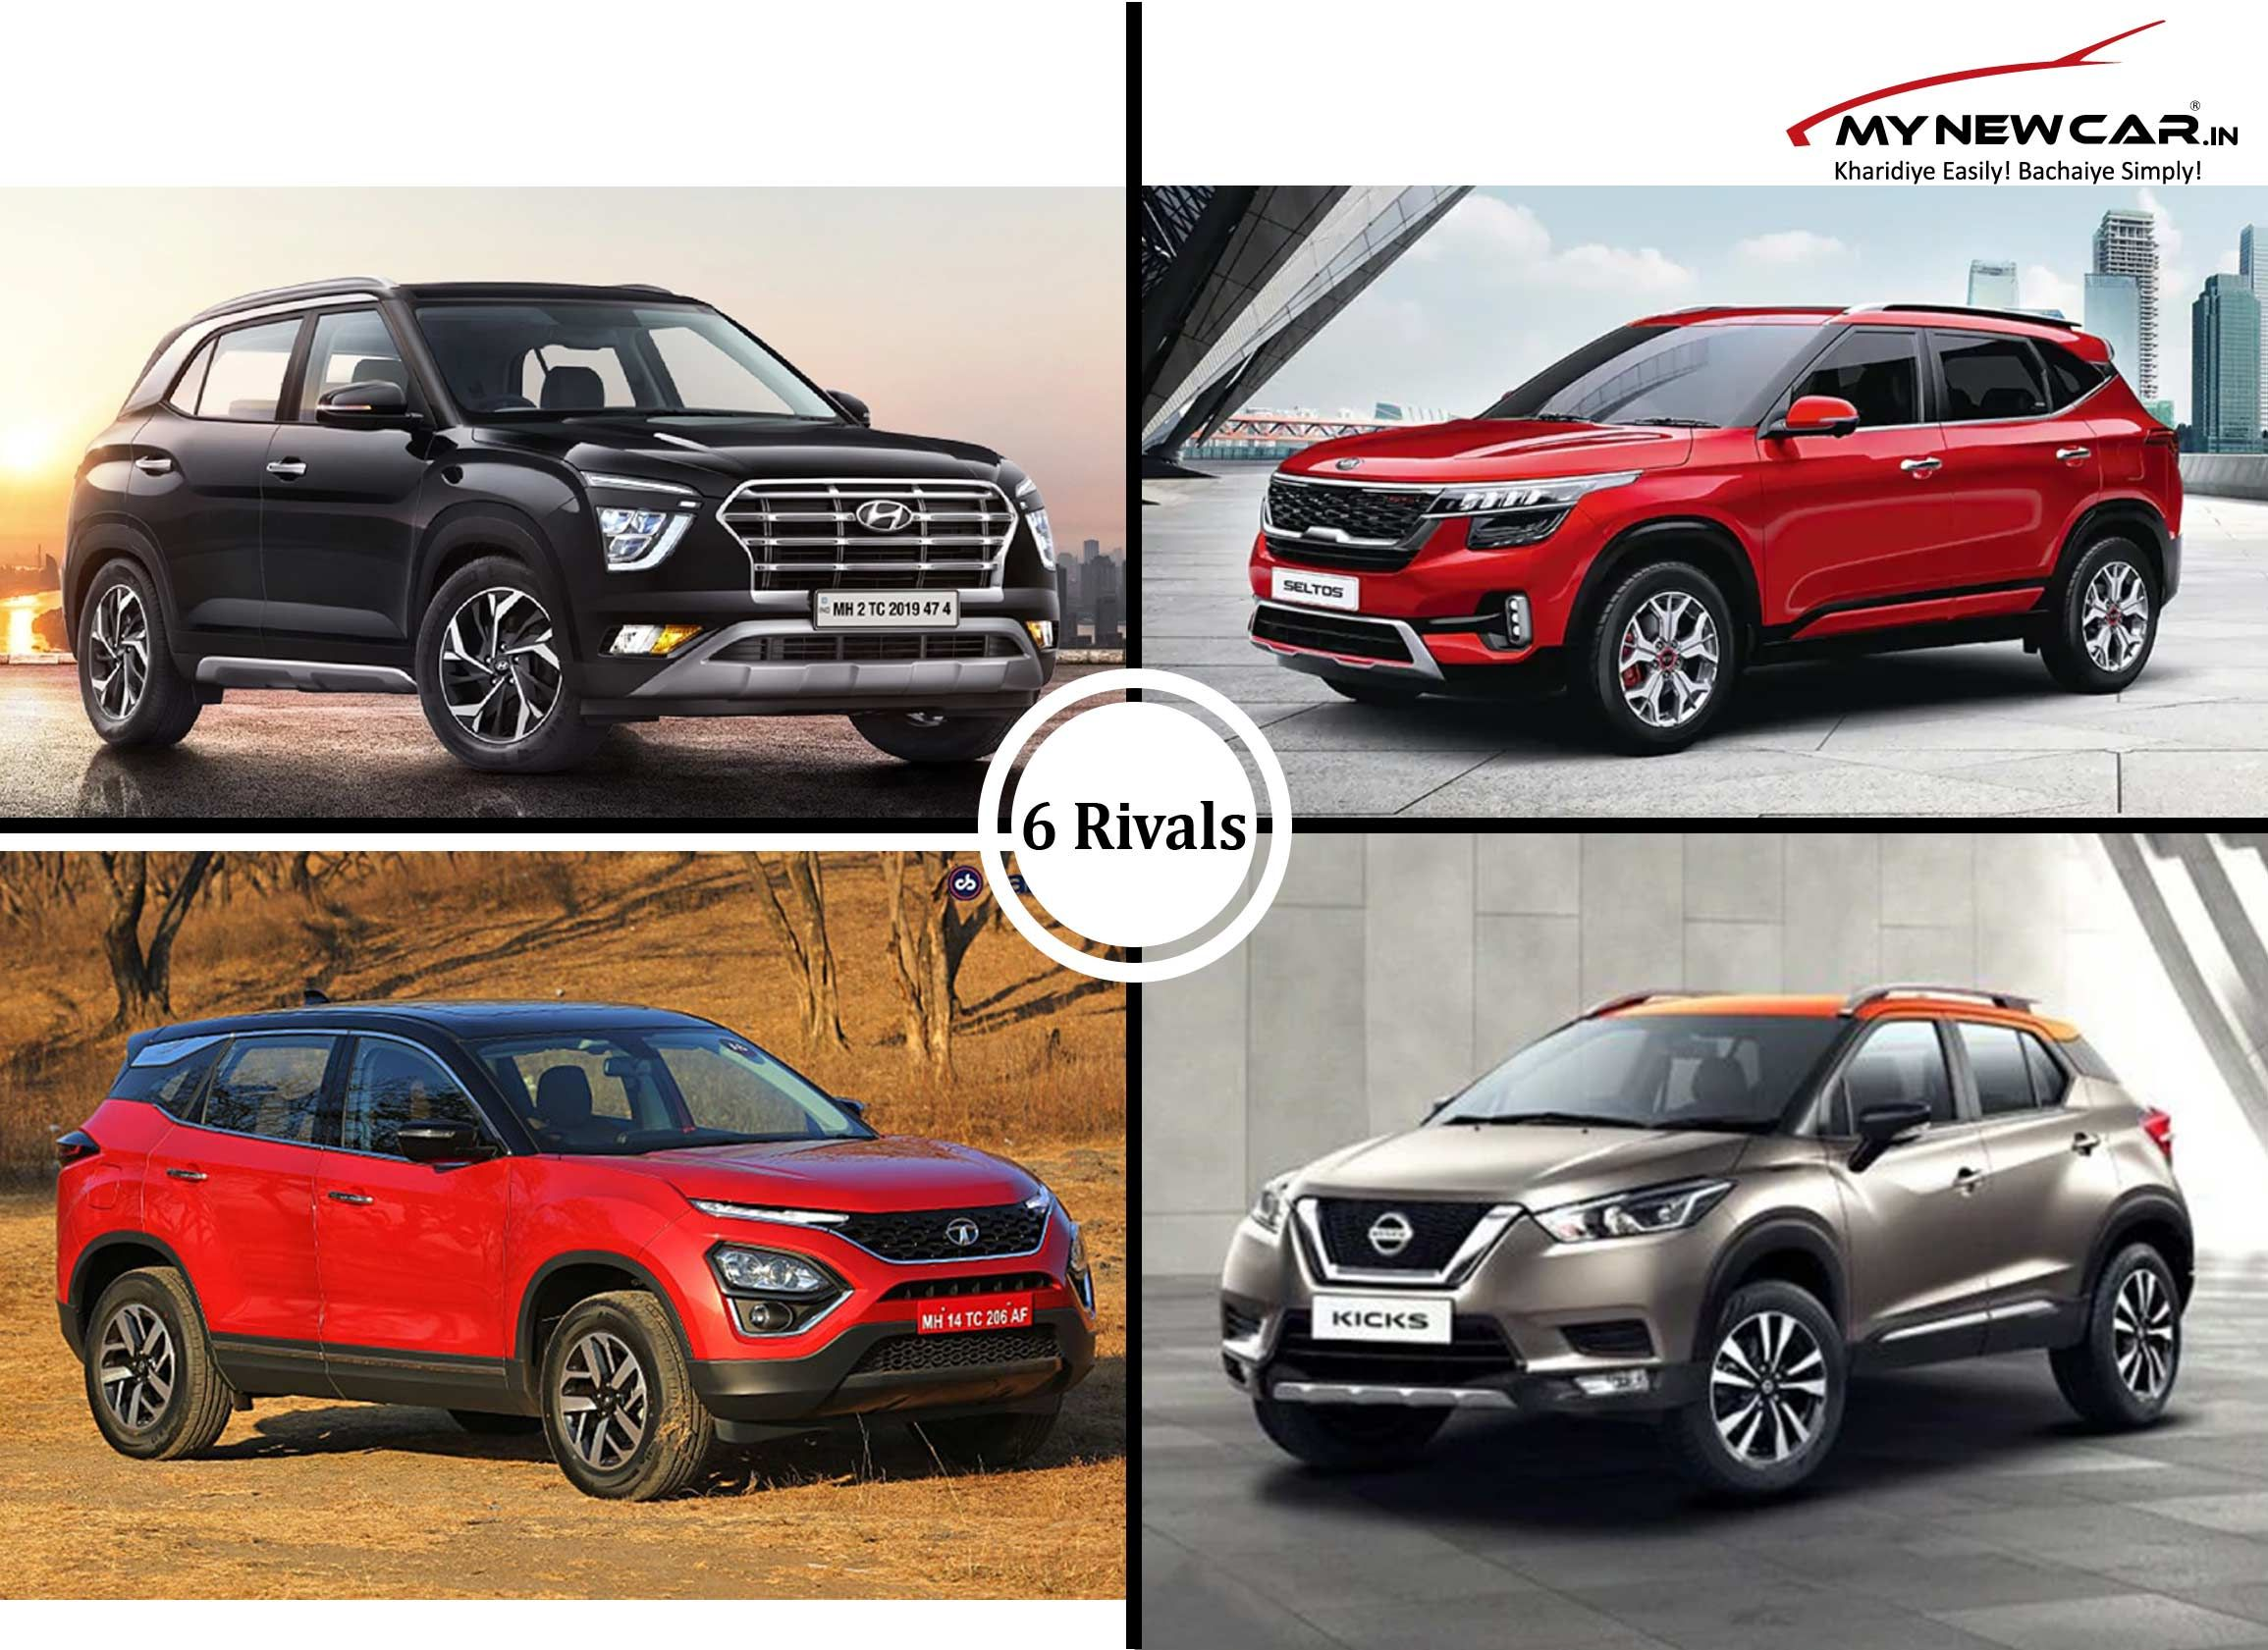 Hyundai Creta Comparison with Rival Cars in 2020 Hyundai